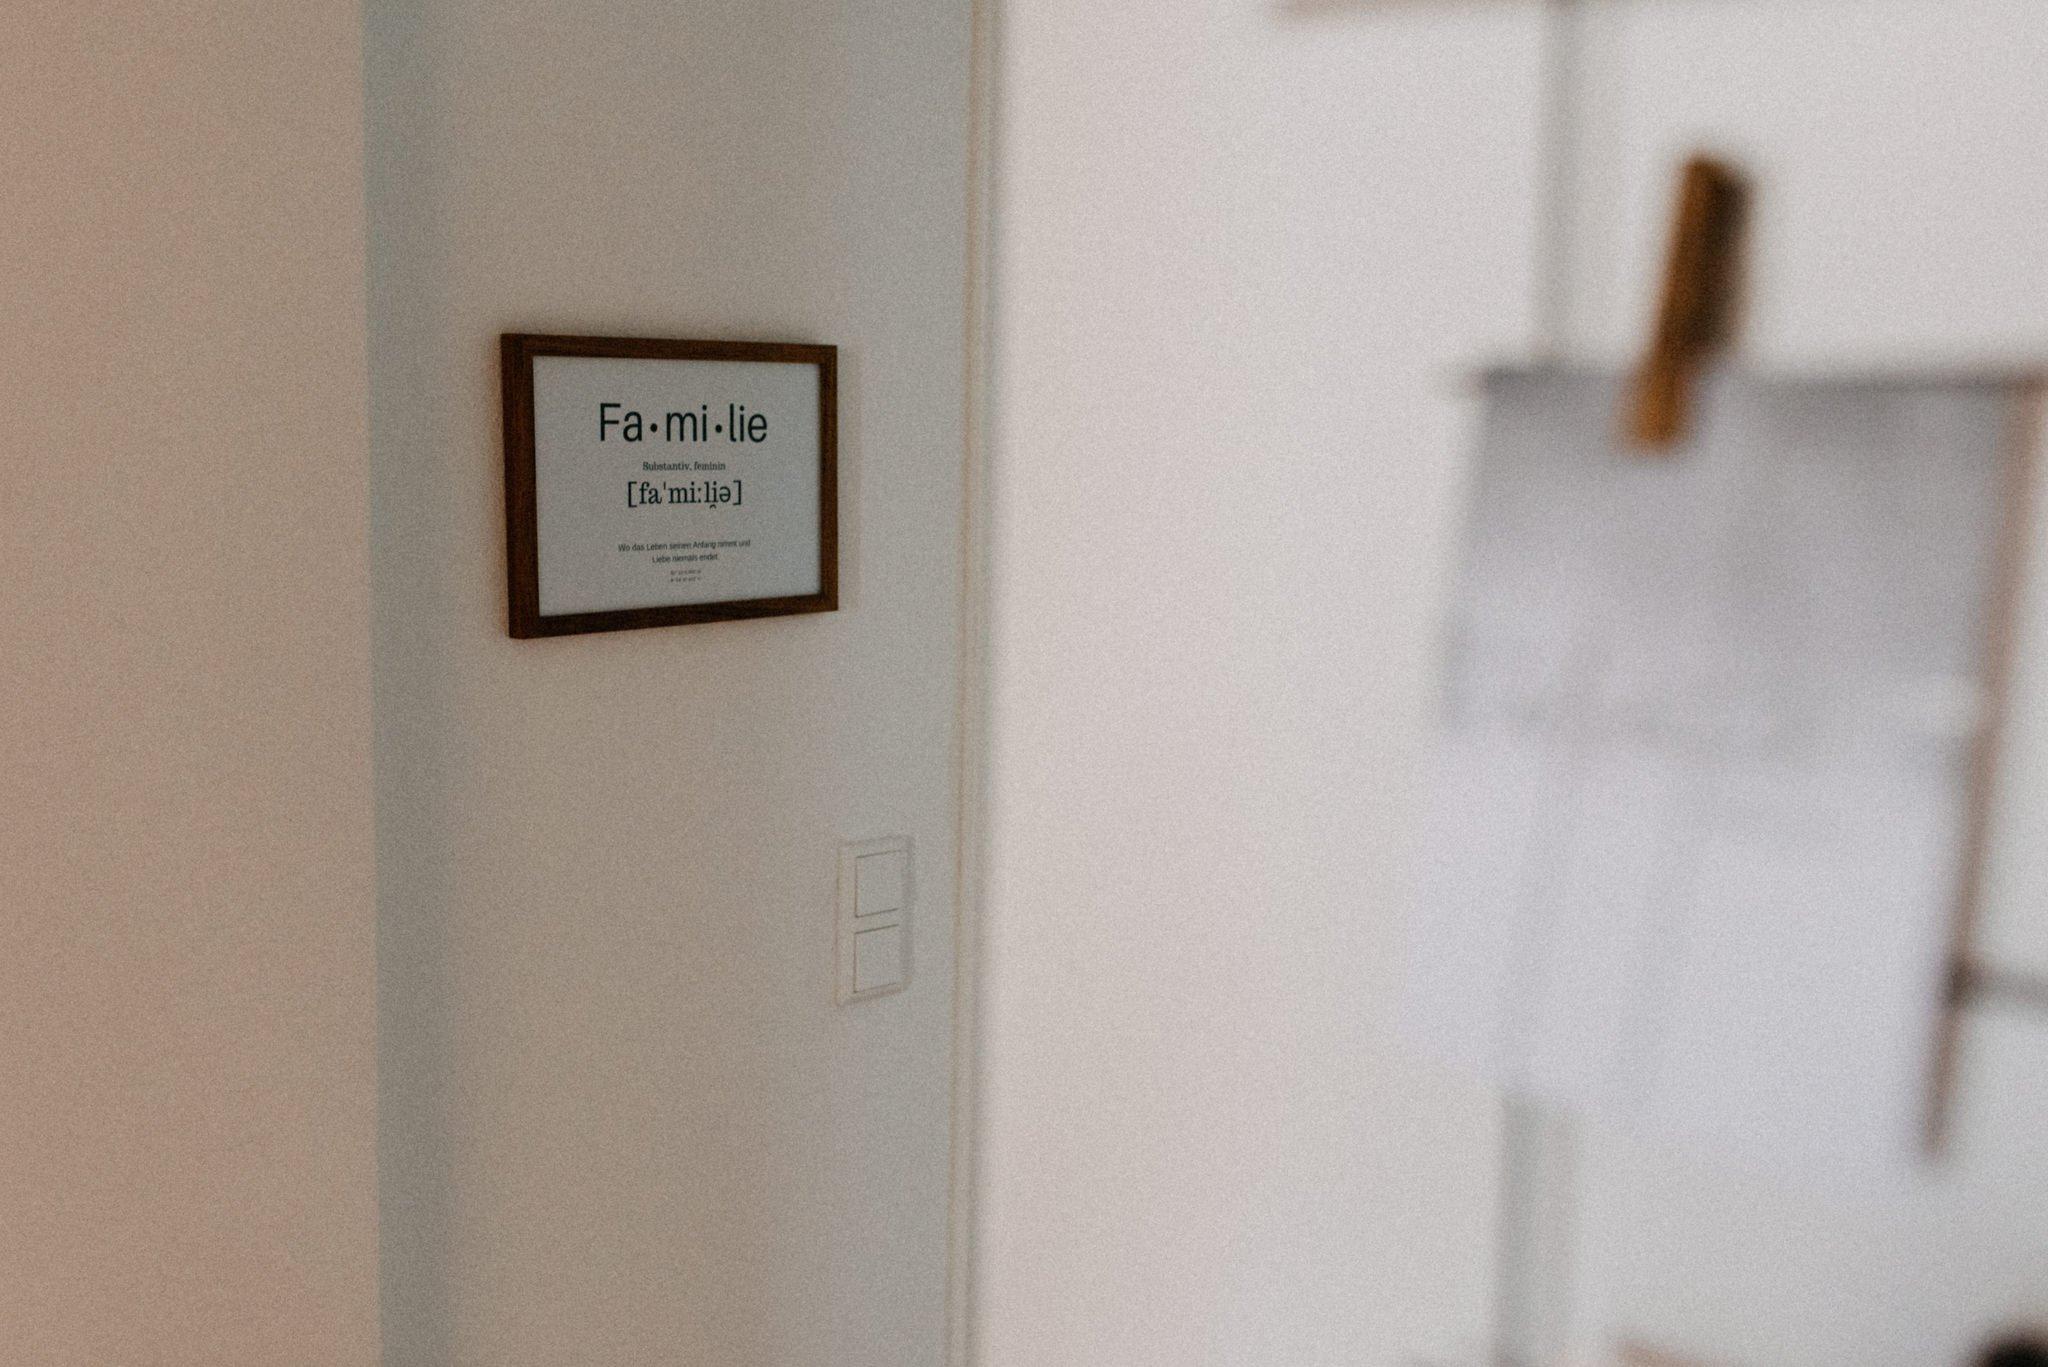 Homestory - Schlafzimmer, Portraitshooting in Darmstadt